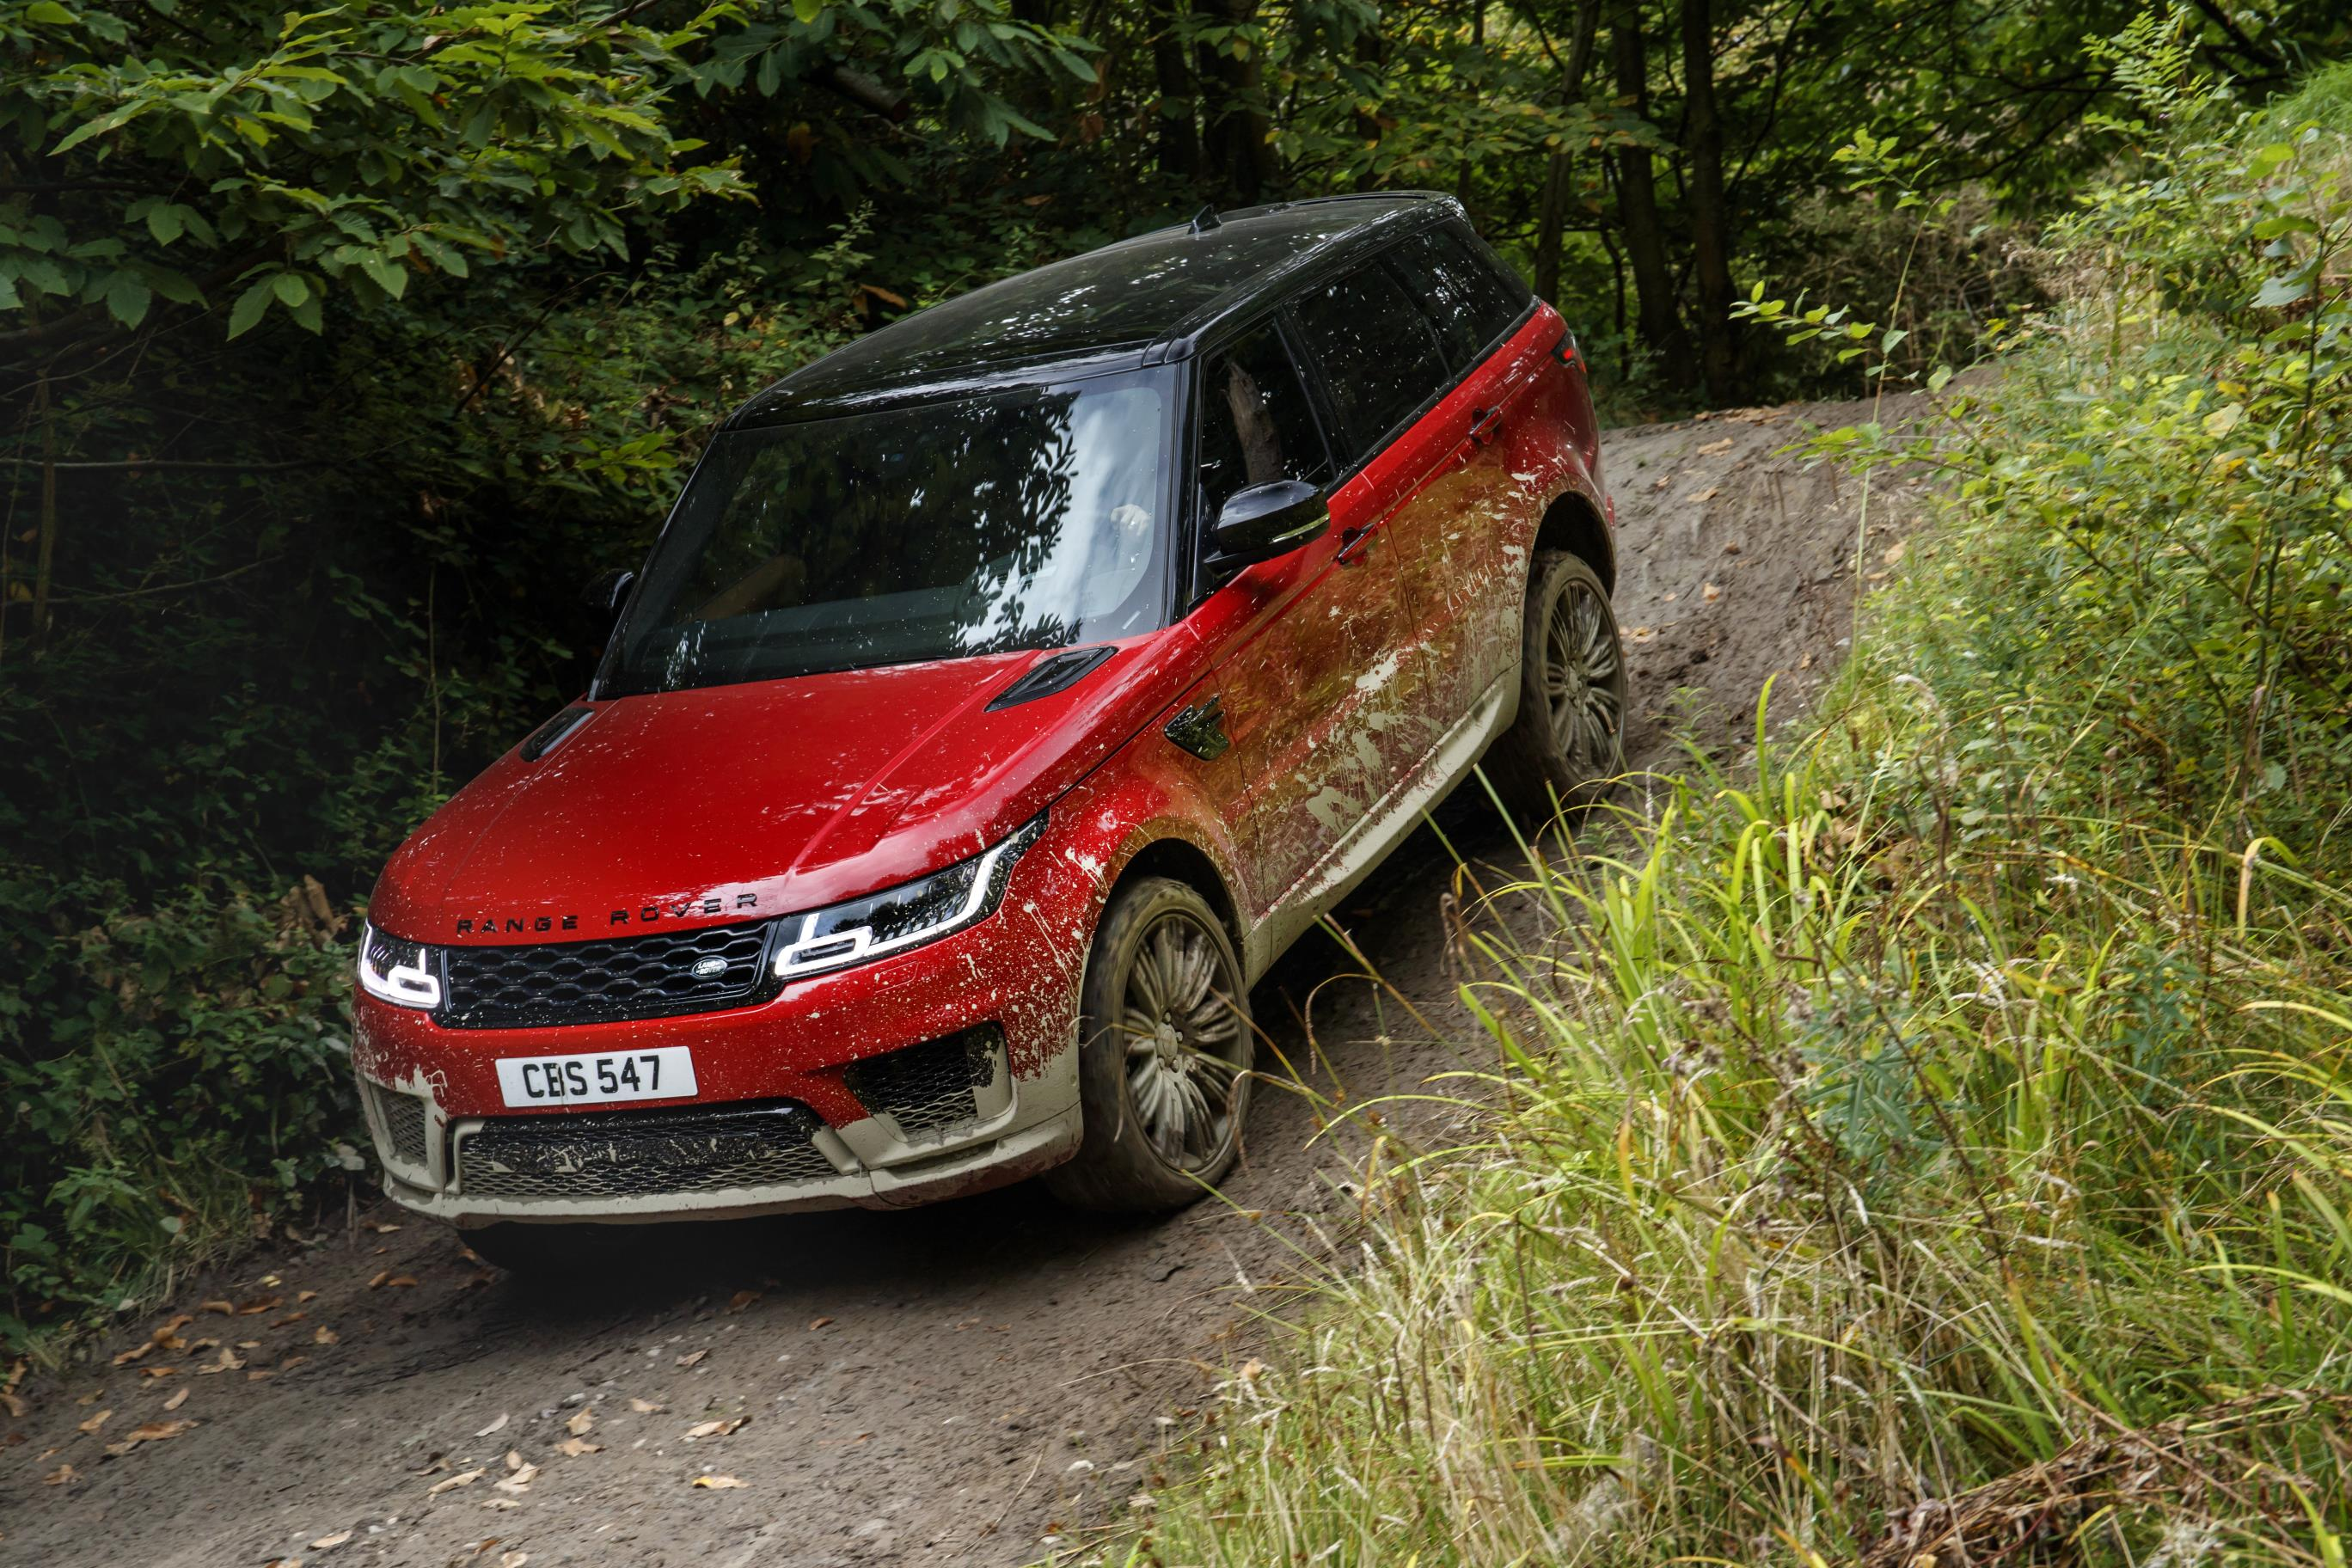 ficial 2018 Range Rover Sport including Plug in Hybrid and SVR